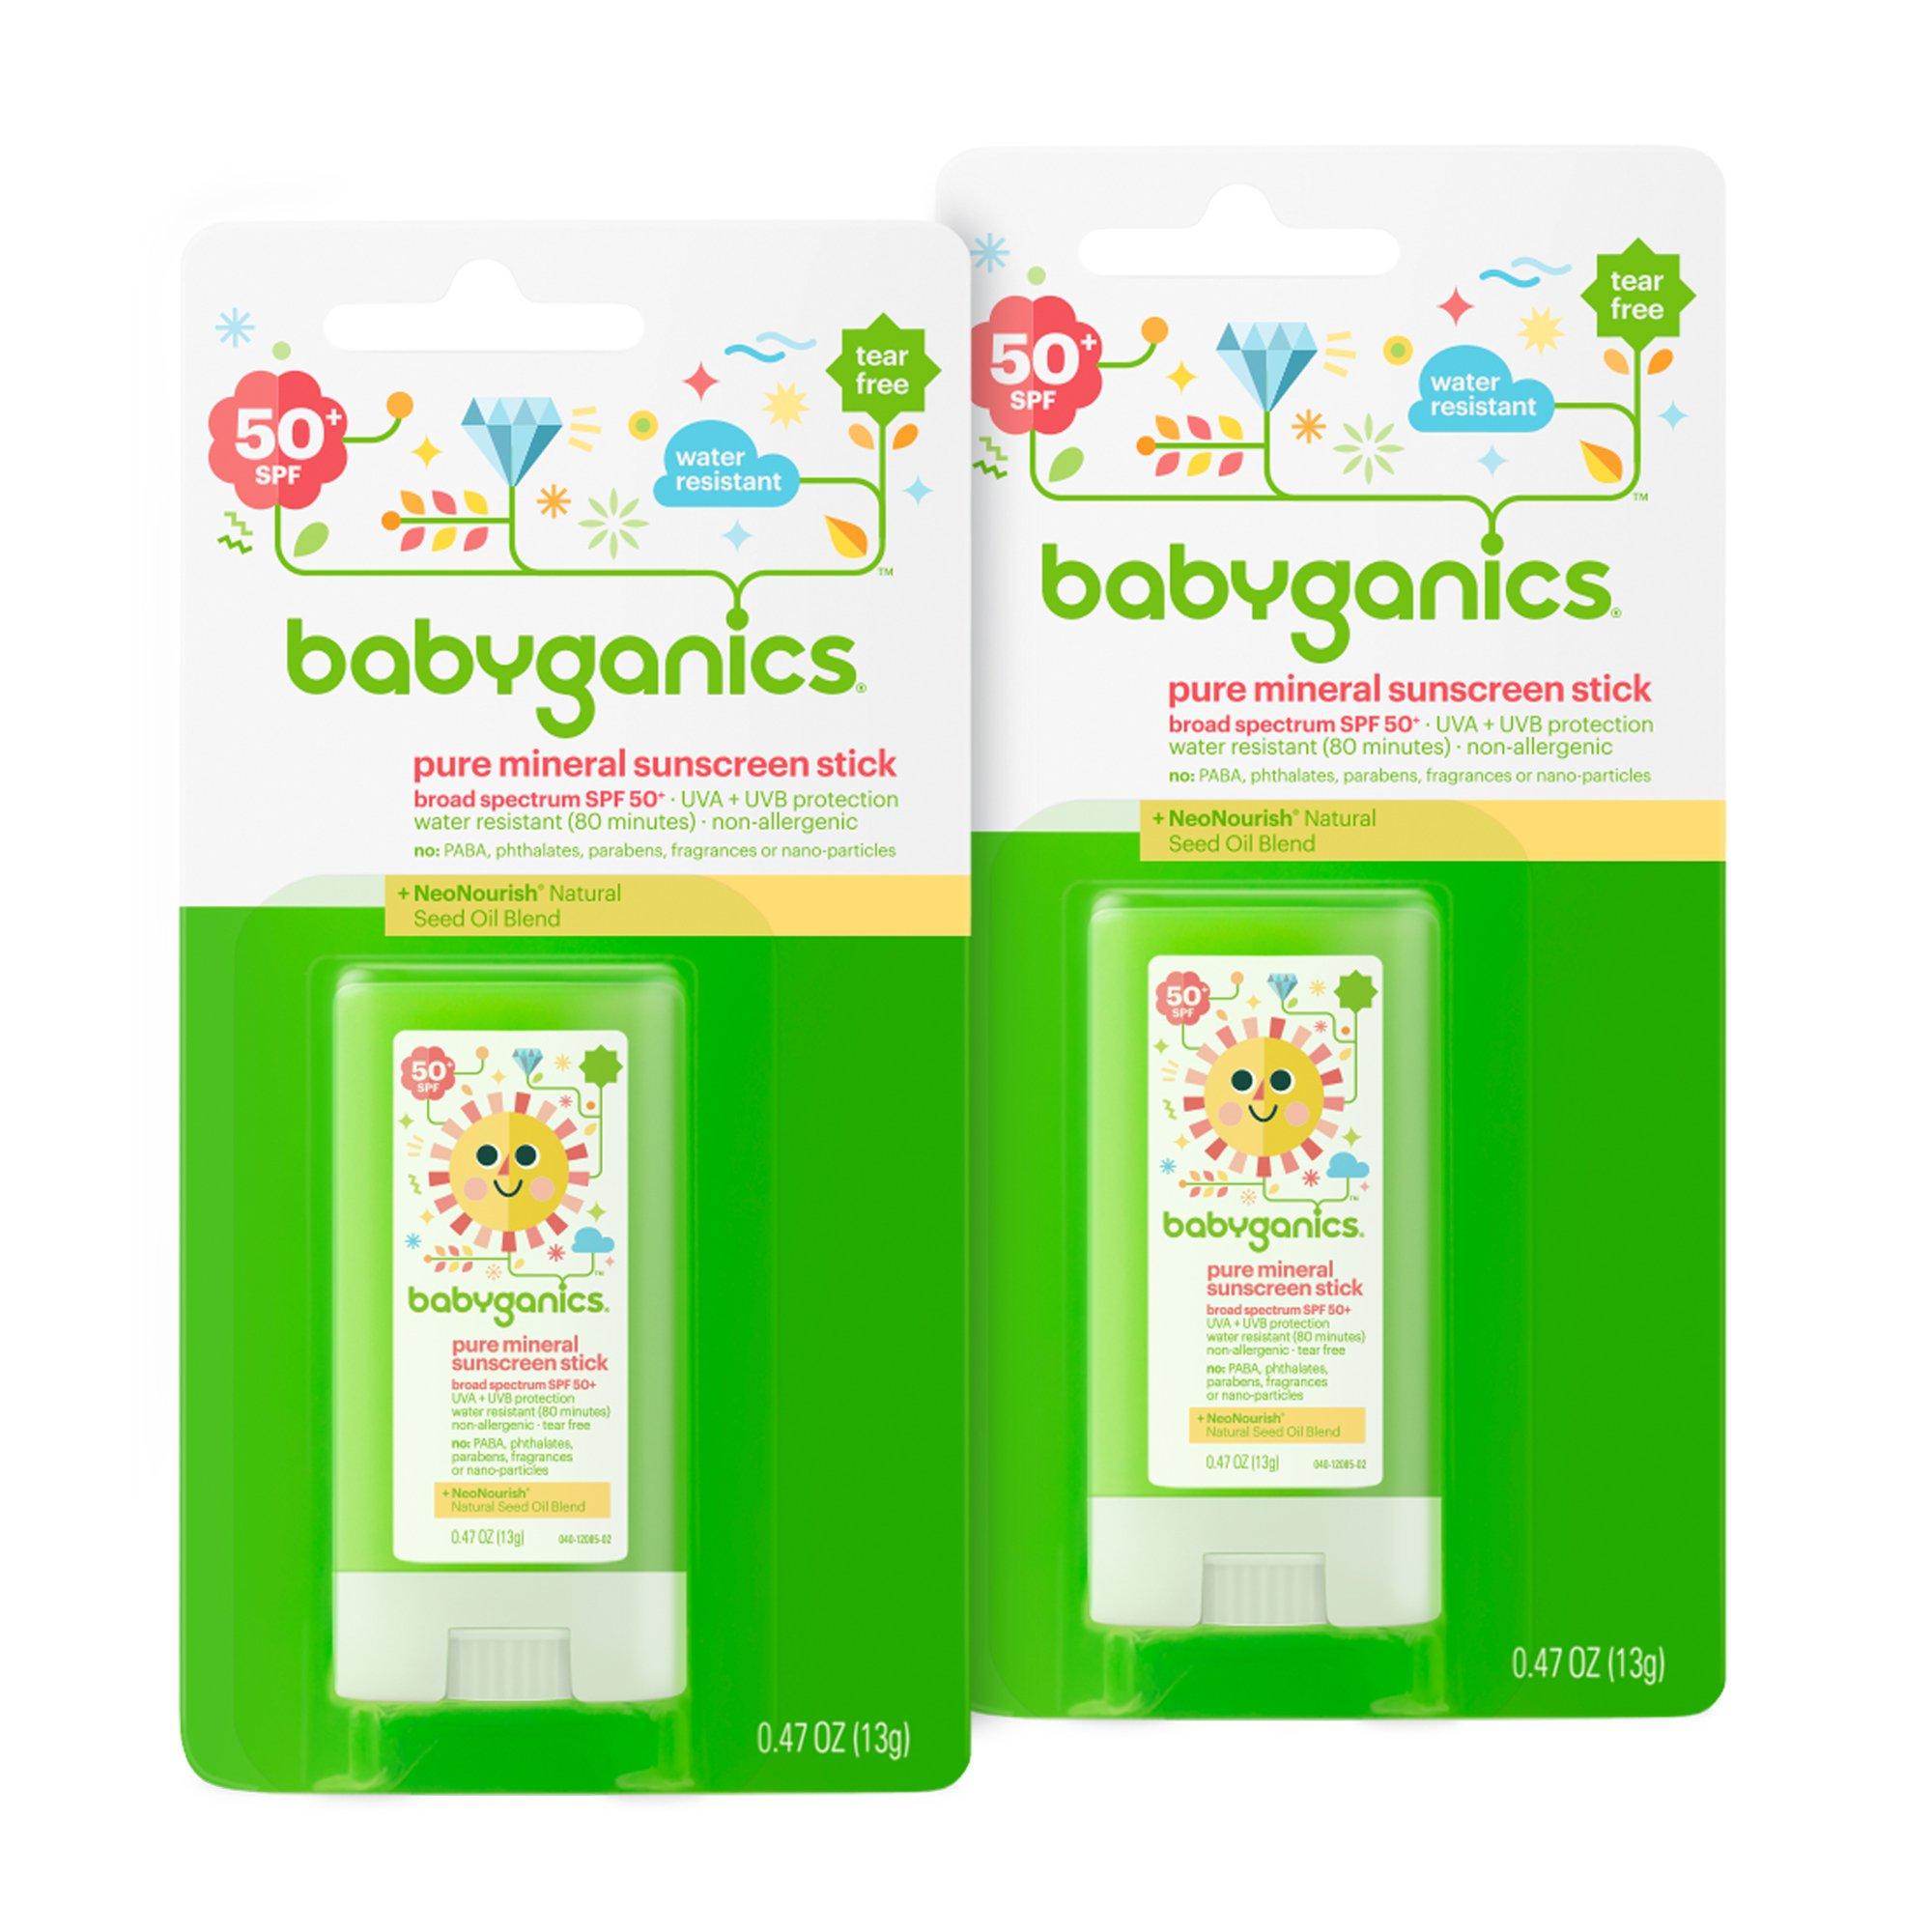 Babyganics Sunscreen Stick SPF 50, .47oz Stick (Pack of 2) by Babyganics